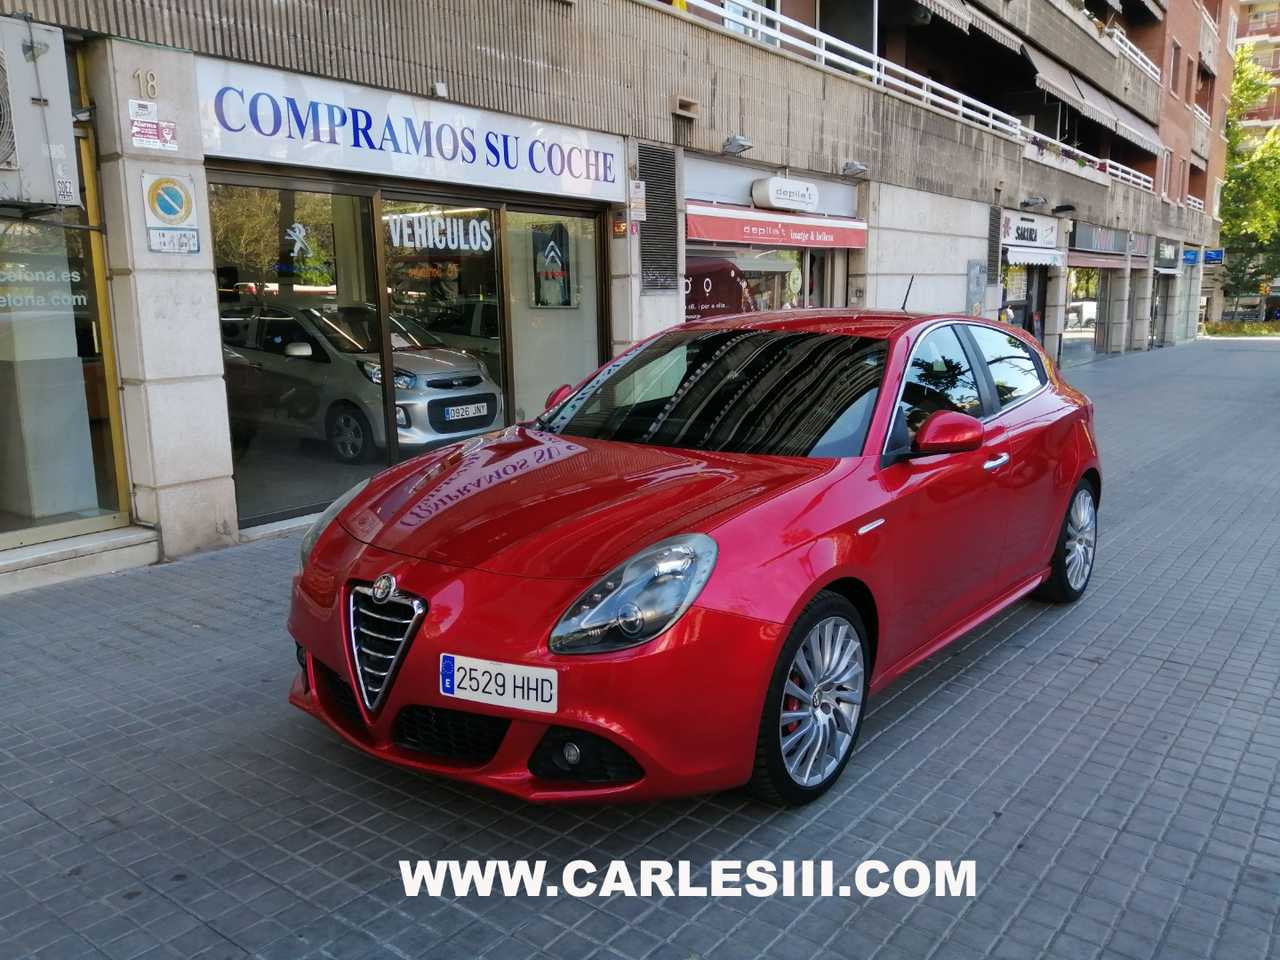 Alfa Romeo Giulietta 1.4 TB Multiair 170cv TCT Distictive   - Foto 1